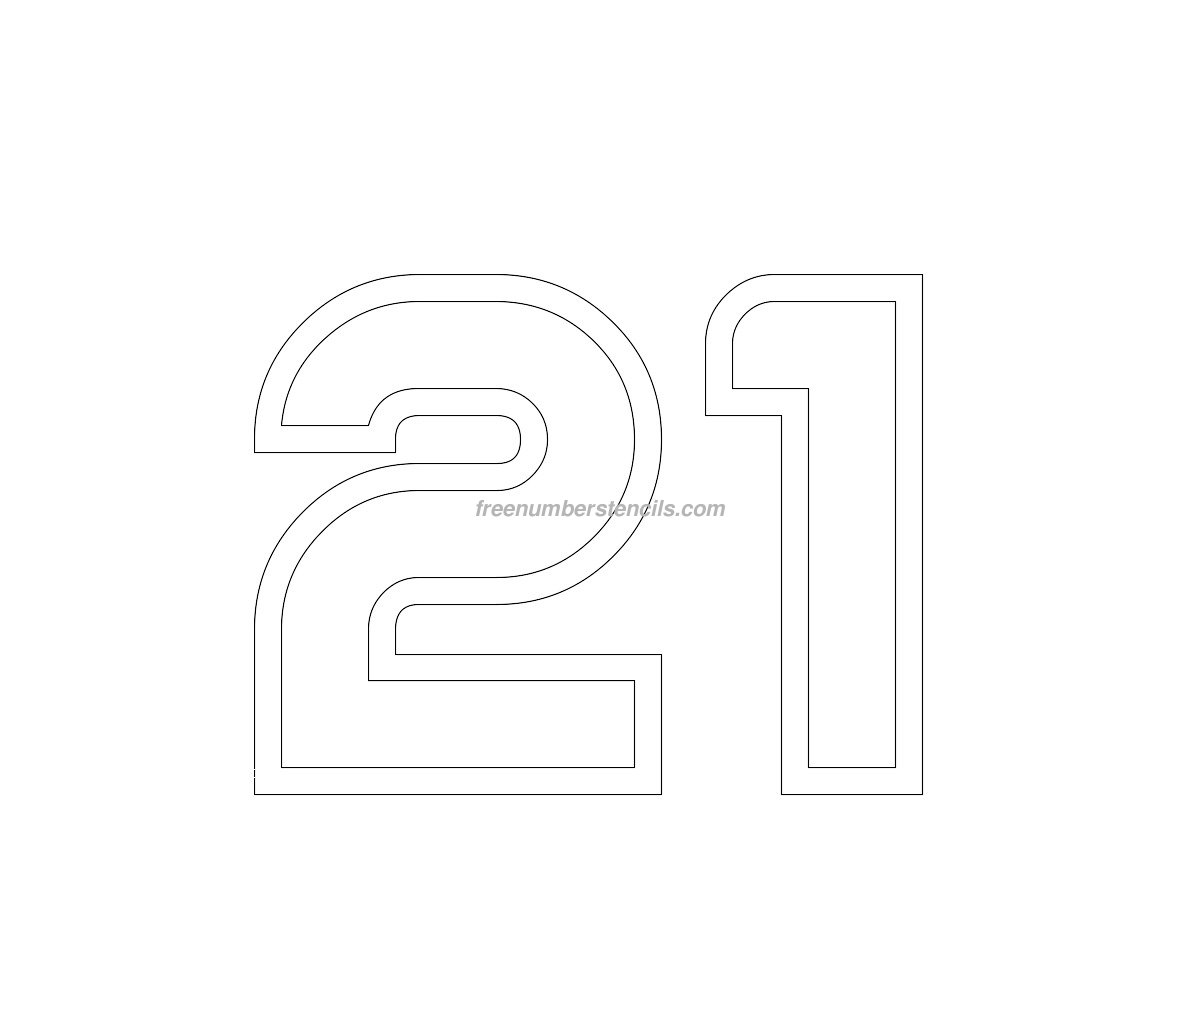 Free Jumbo 23 Number Stencil Freenumberstencils – Number Template